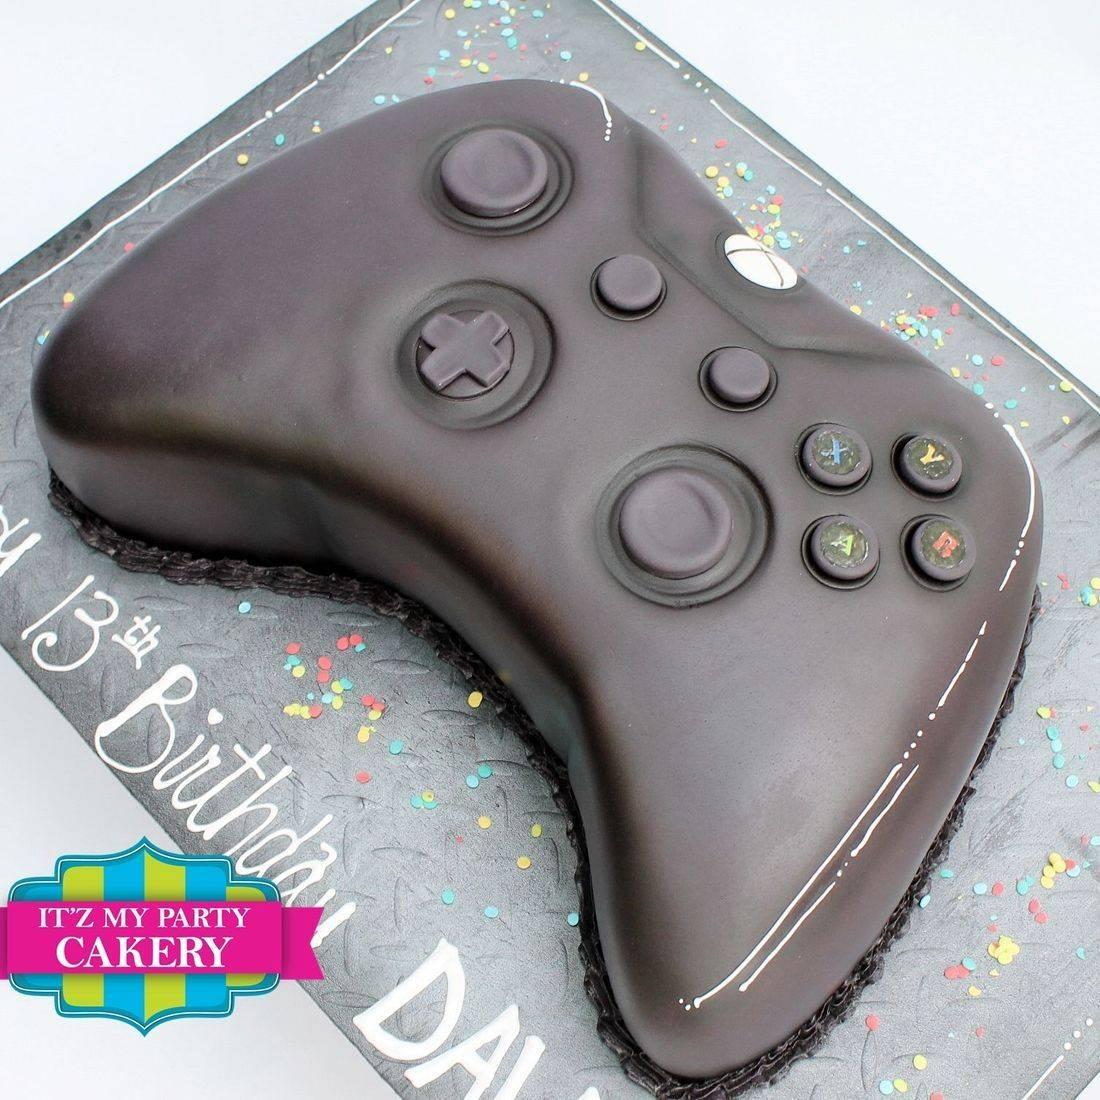 Xbox Controller Cake Dimensional Cake Milwaukee